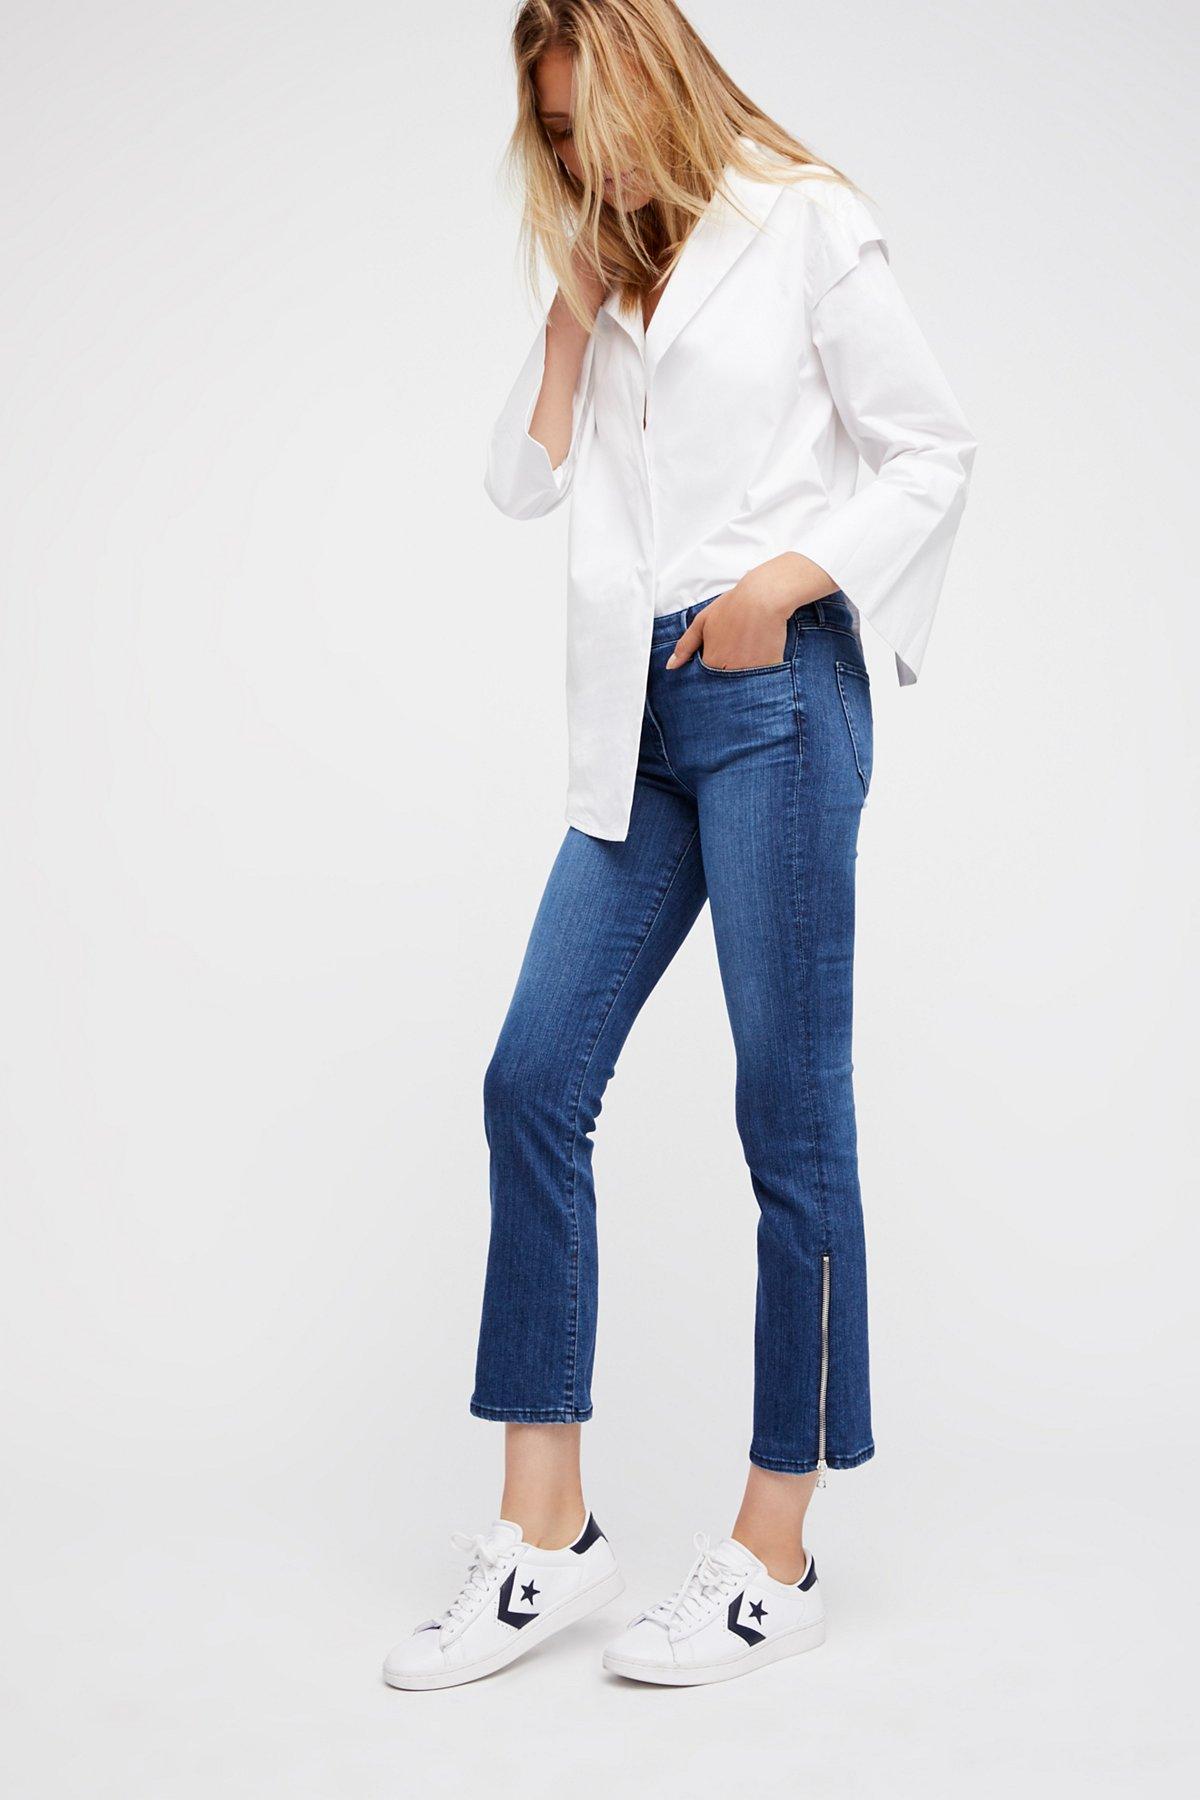 Midway Gusset Zipper Crop Jeans